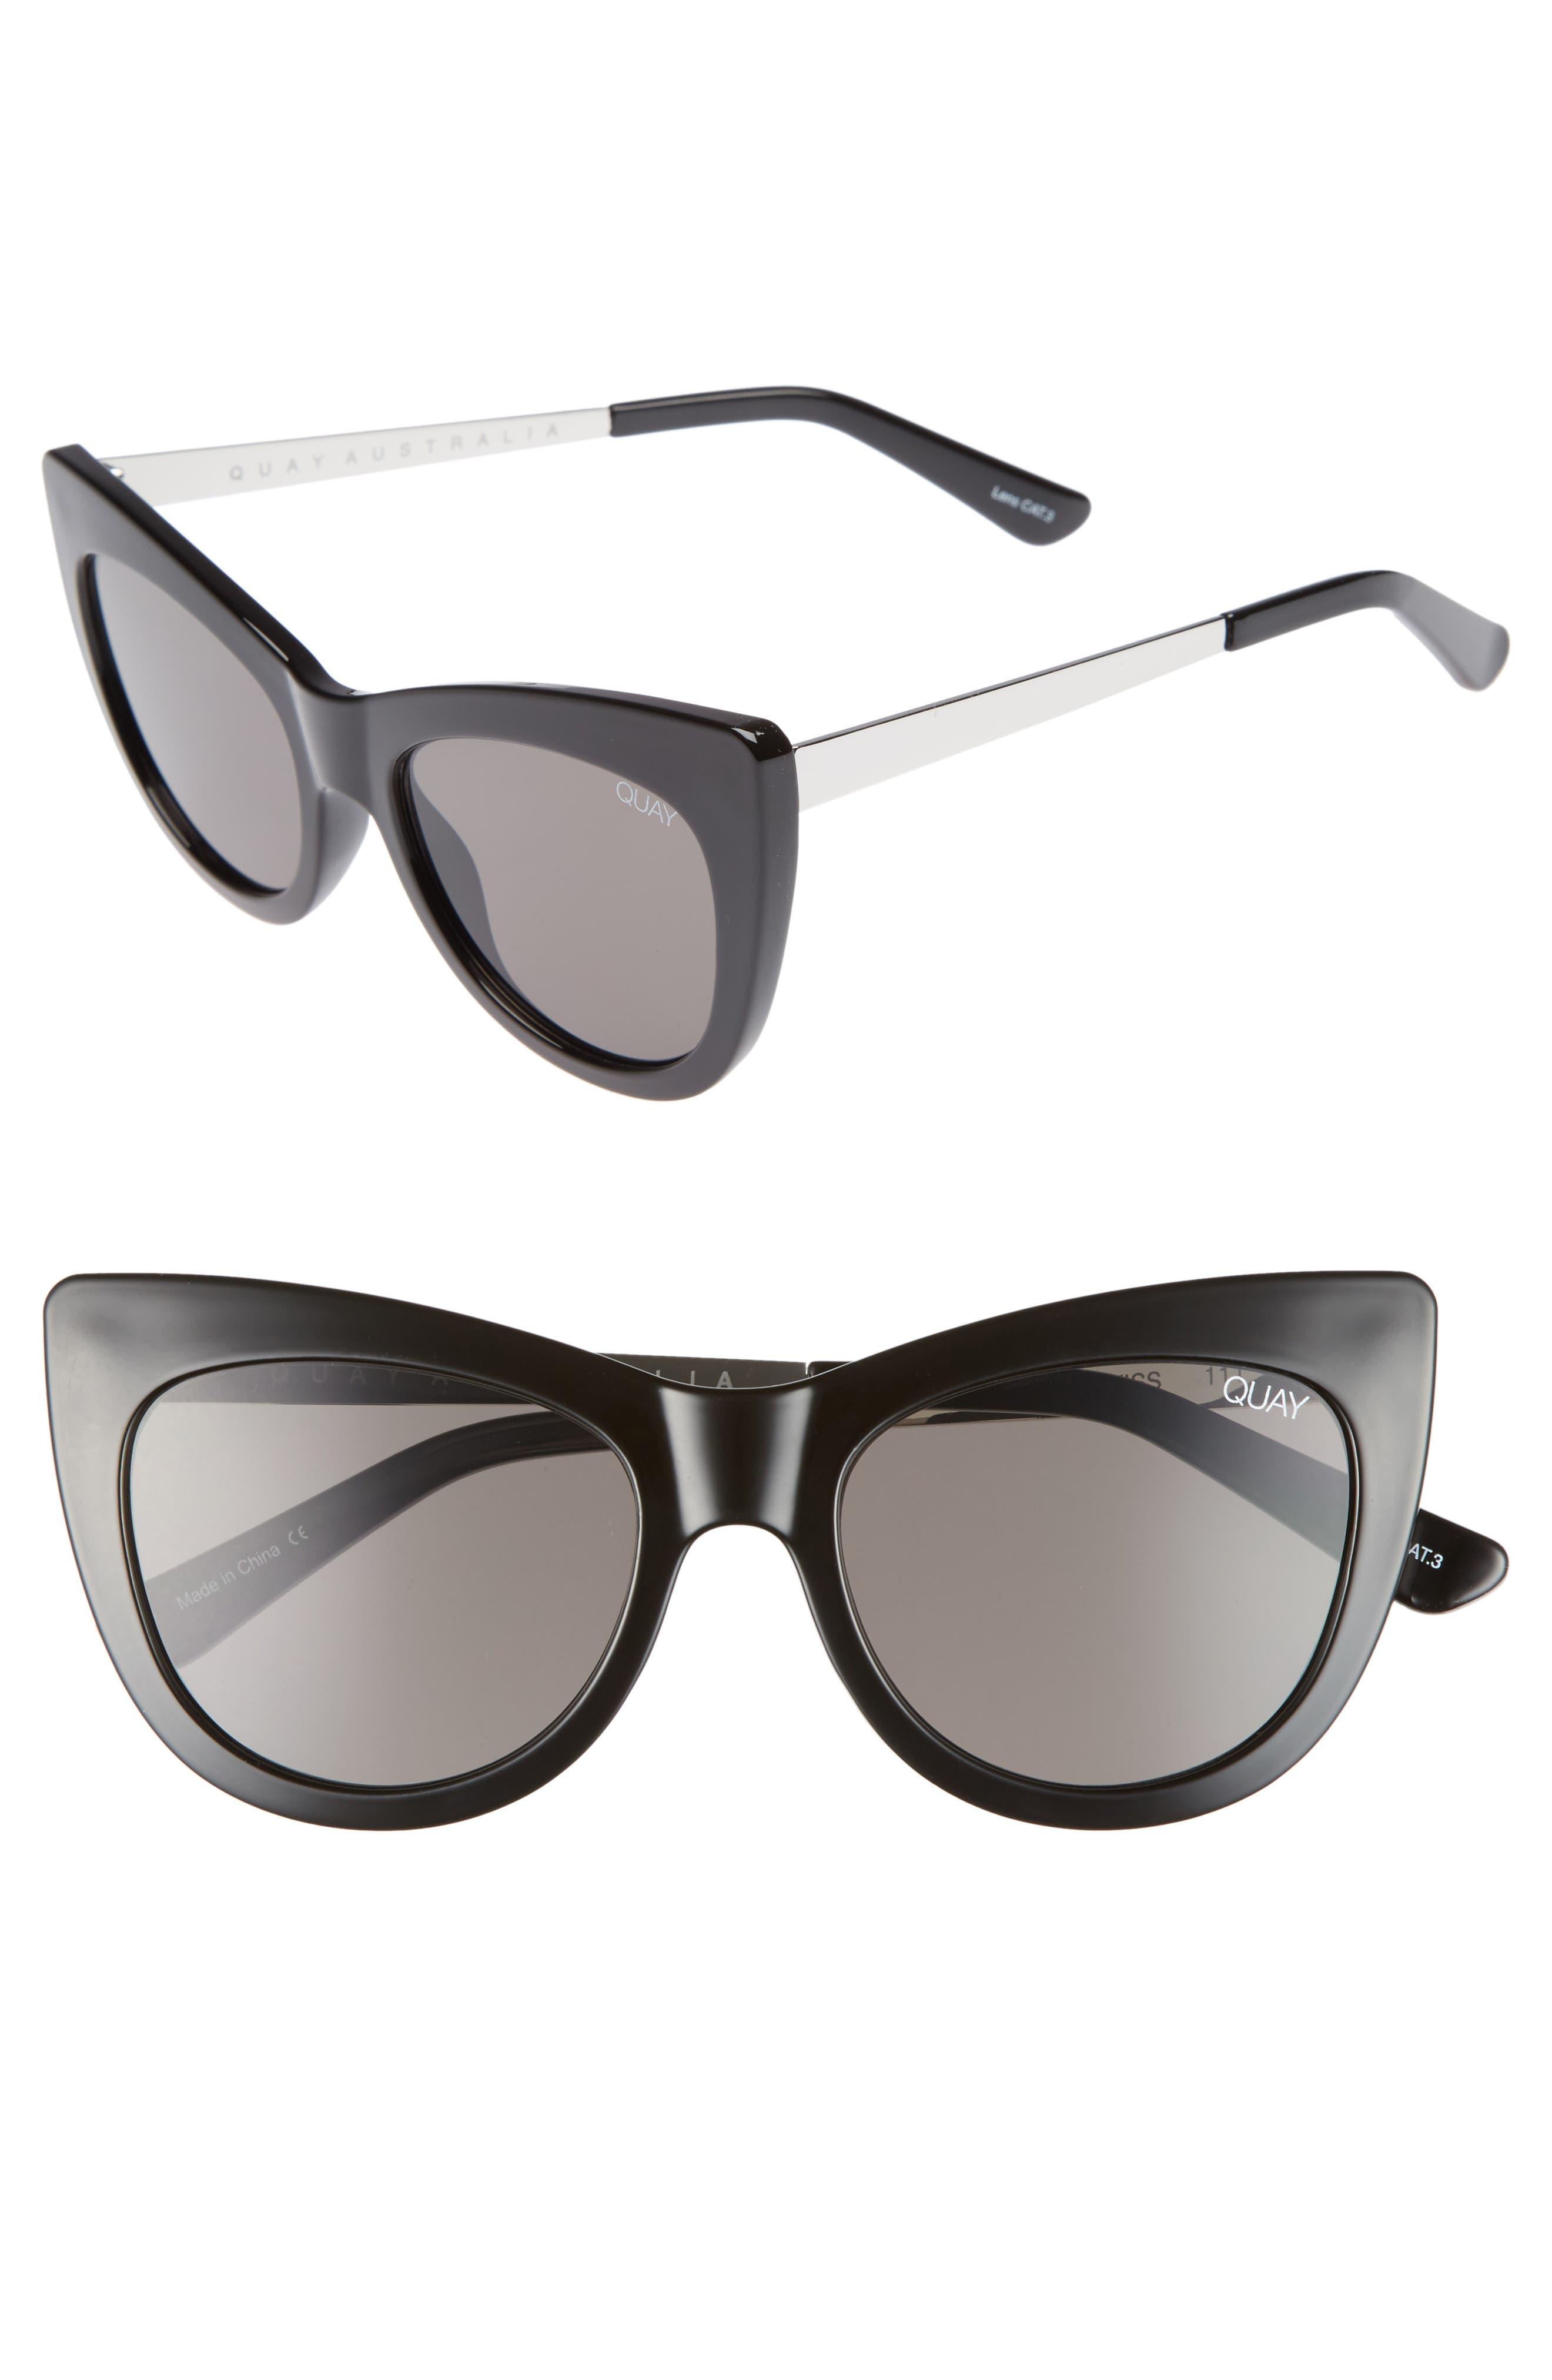 53mm Steal a Kiss Cat-eye Sunglasses,                             Main thumbnail 1, color,                             001